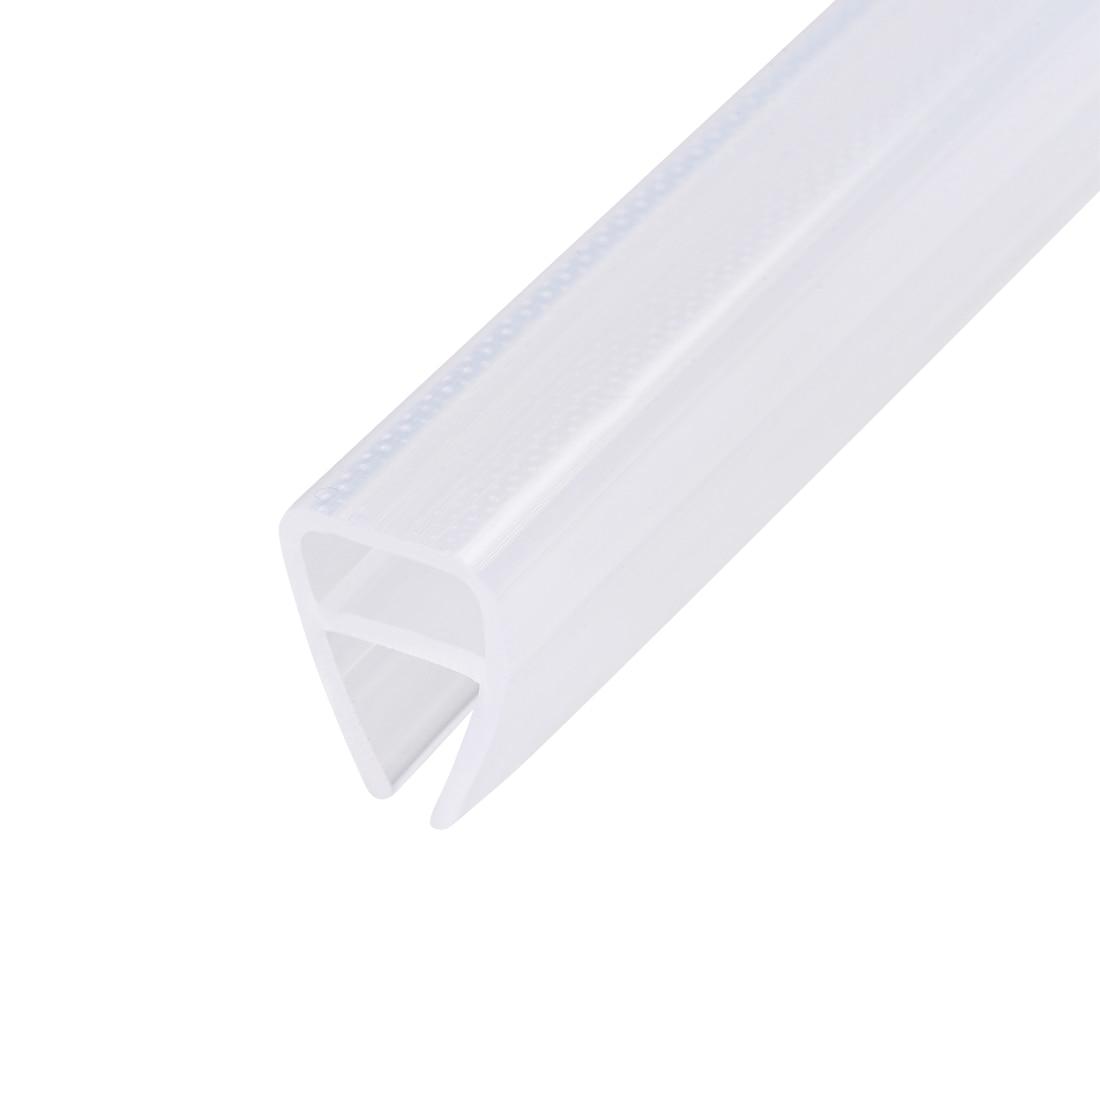 Uxcell, 1 Uds., puerta de ducha de vidrio sin marco, tira de sellado lateral inferior, tipo U, w 8mm, Riel de goteo, vidrio de 6-12mm x 1/2/3m de longitud